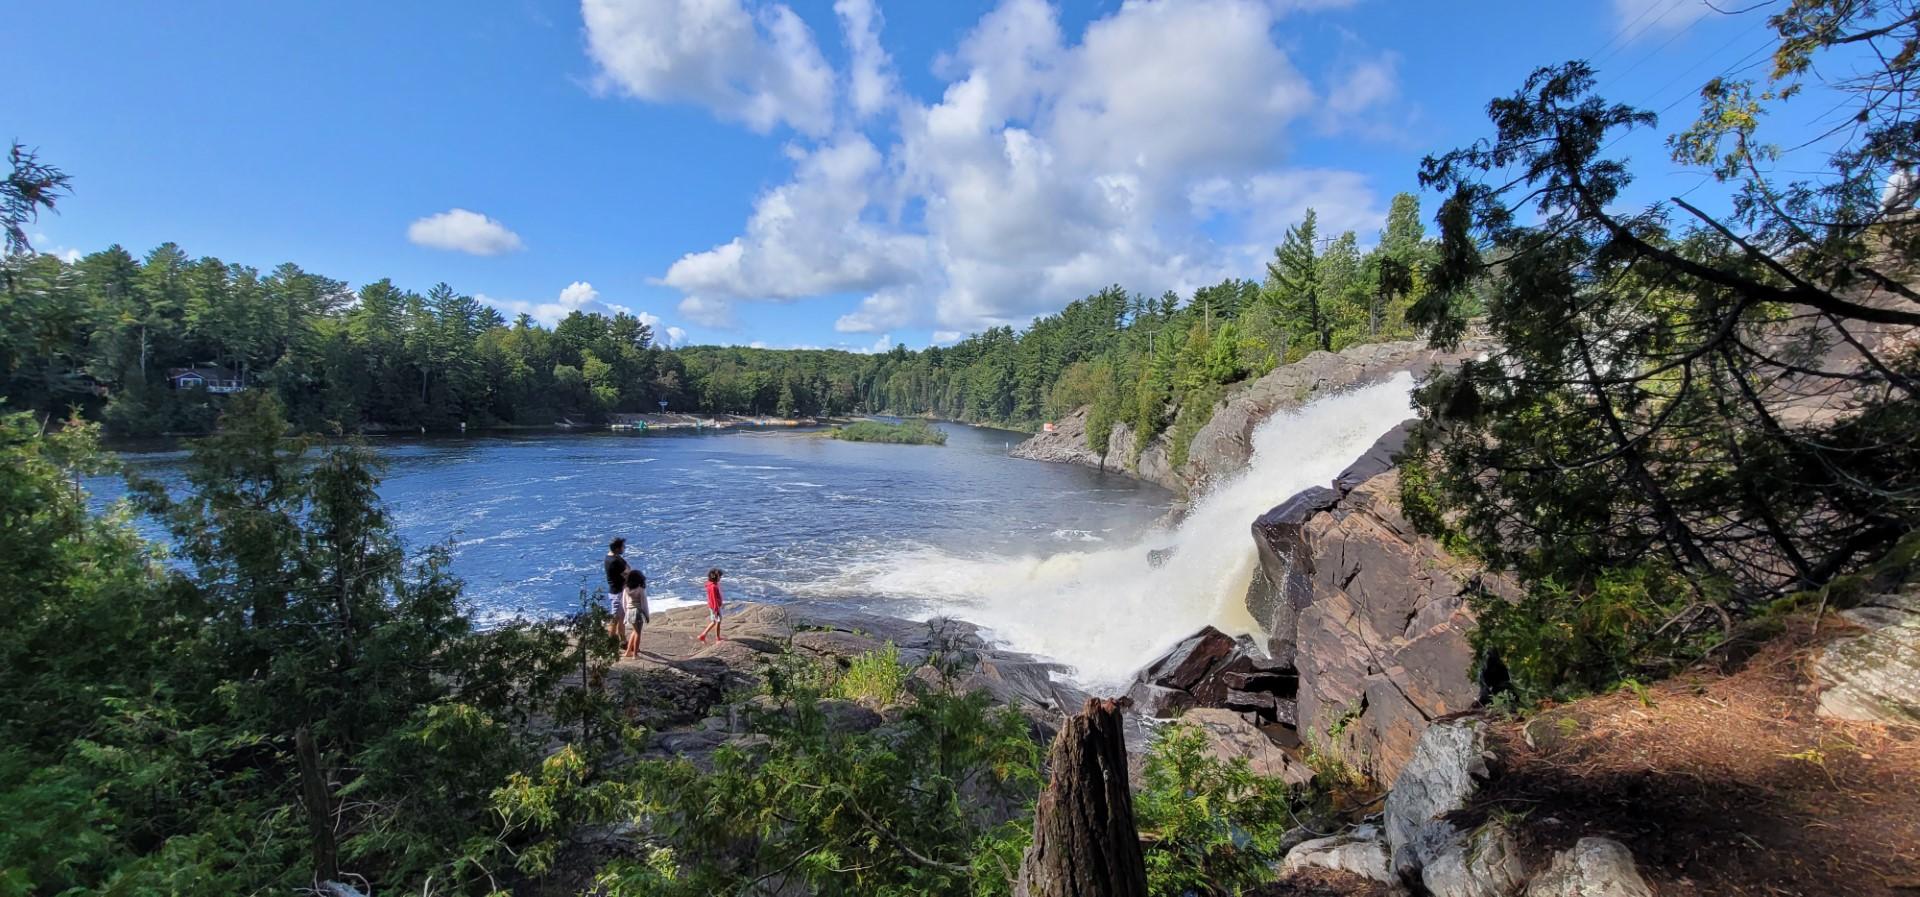 bracebridge waterfalls with people in distance